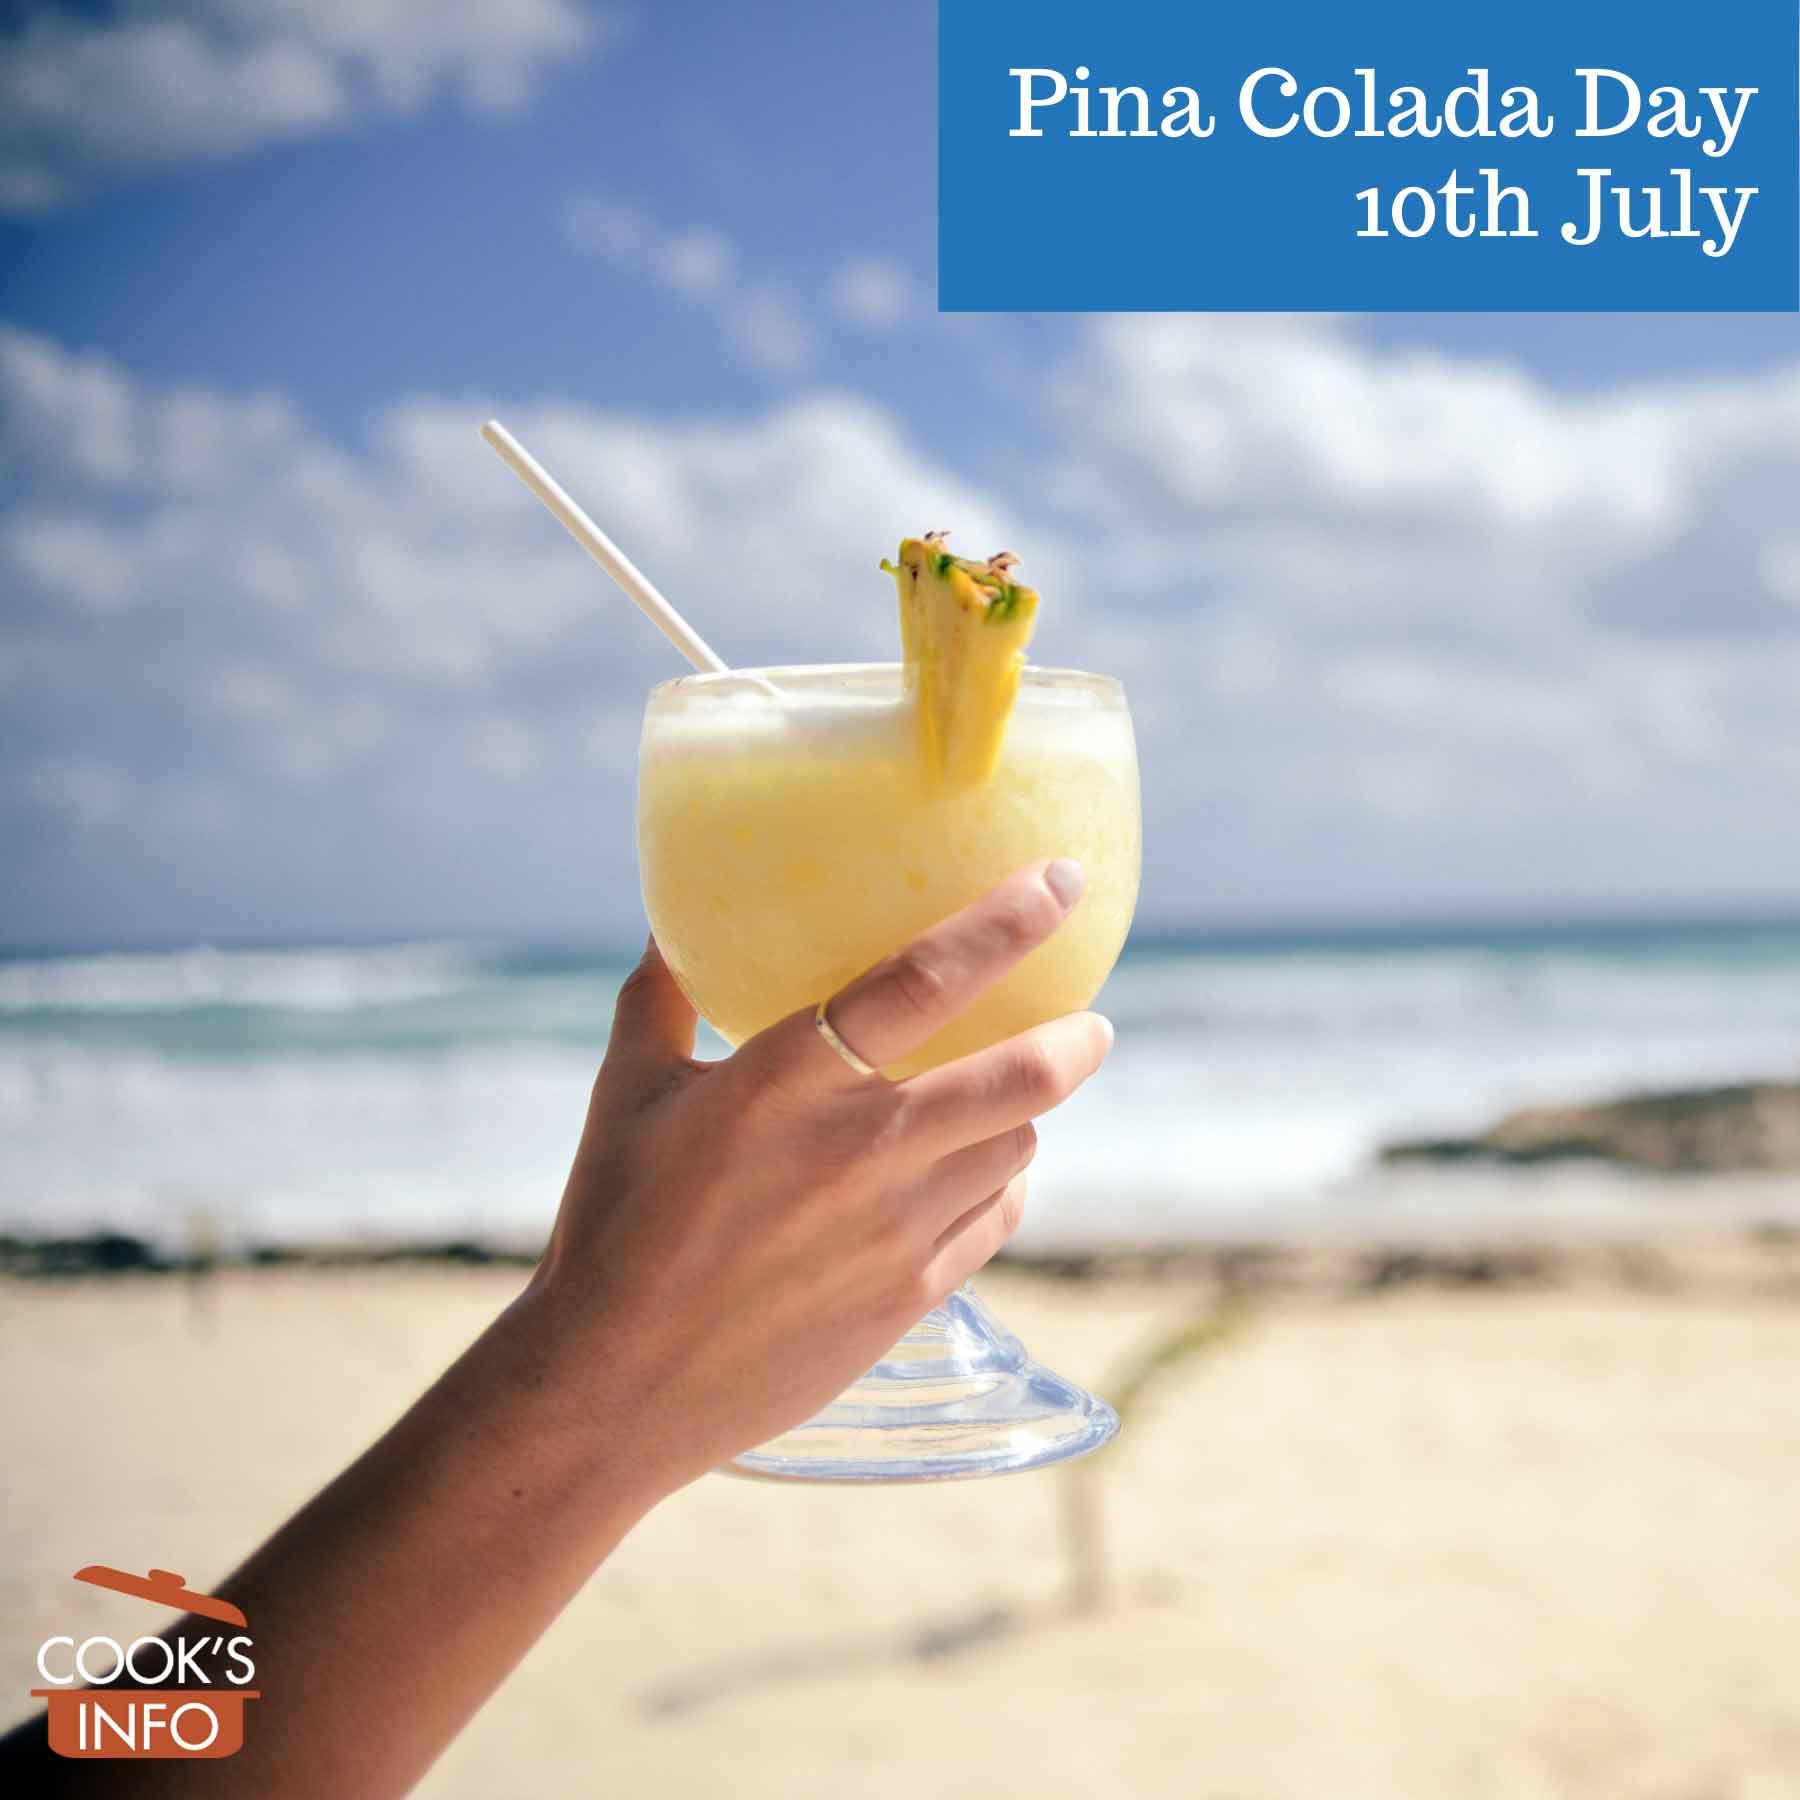 Pina colada by the shore